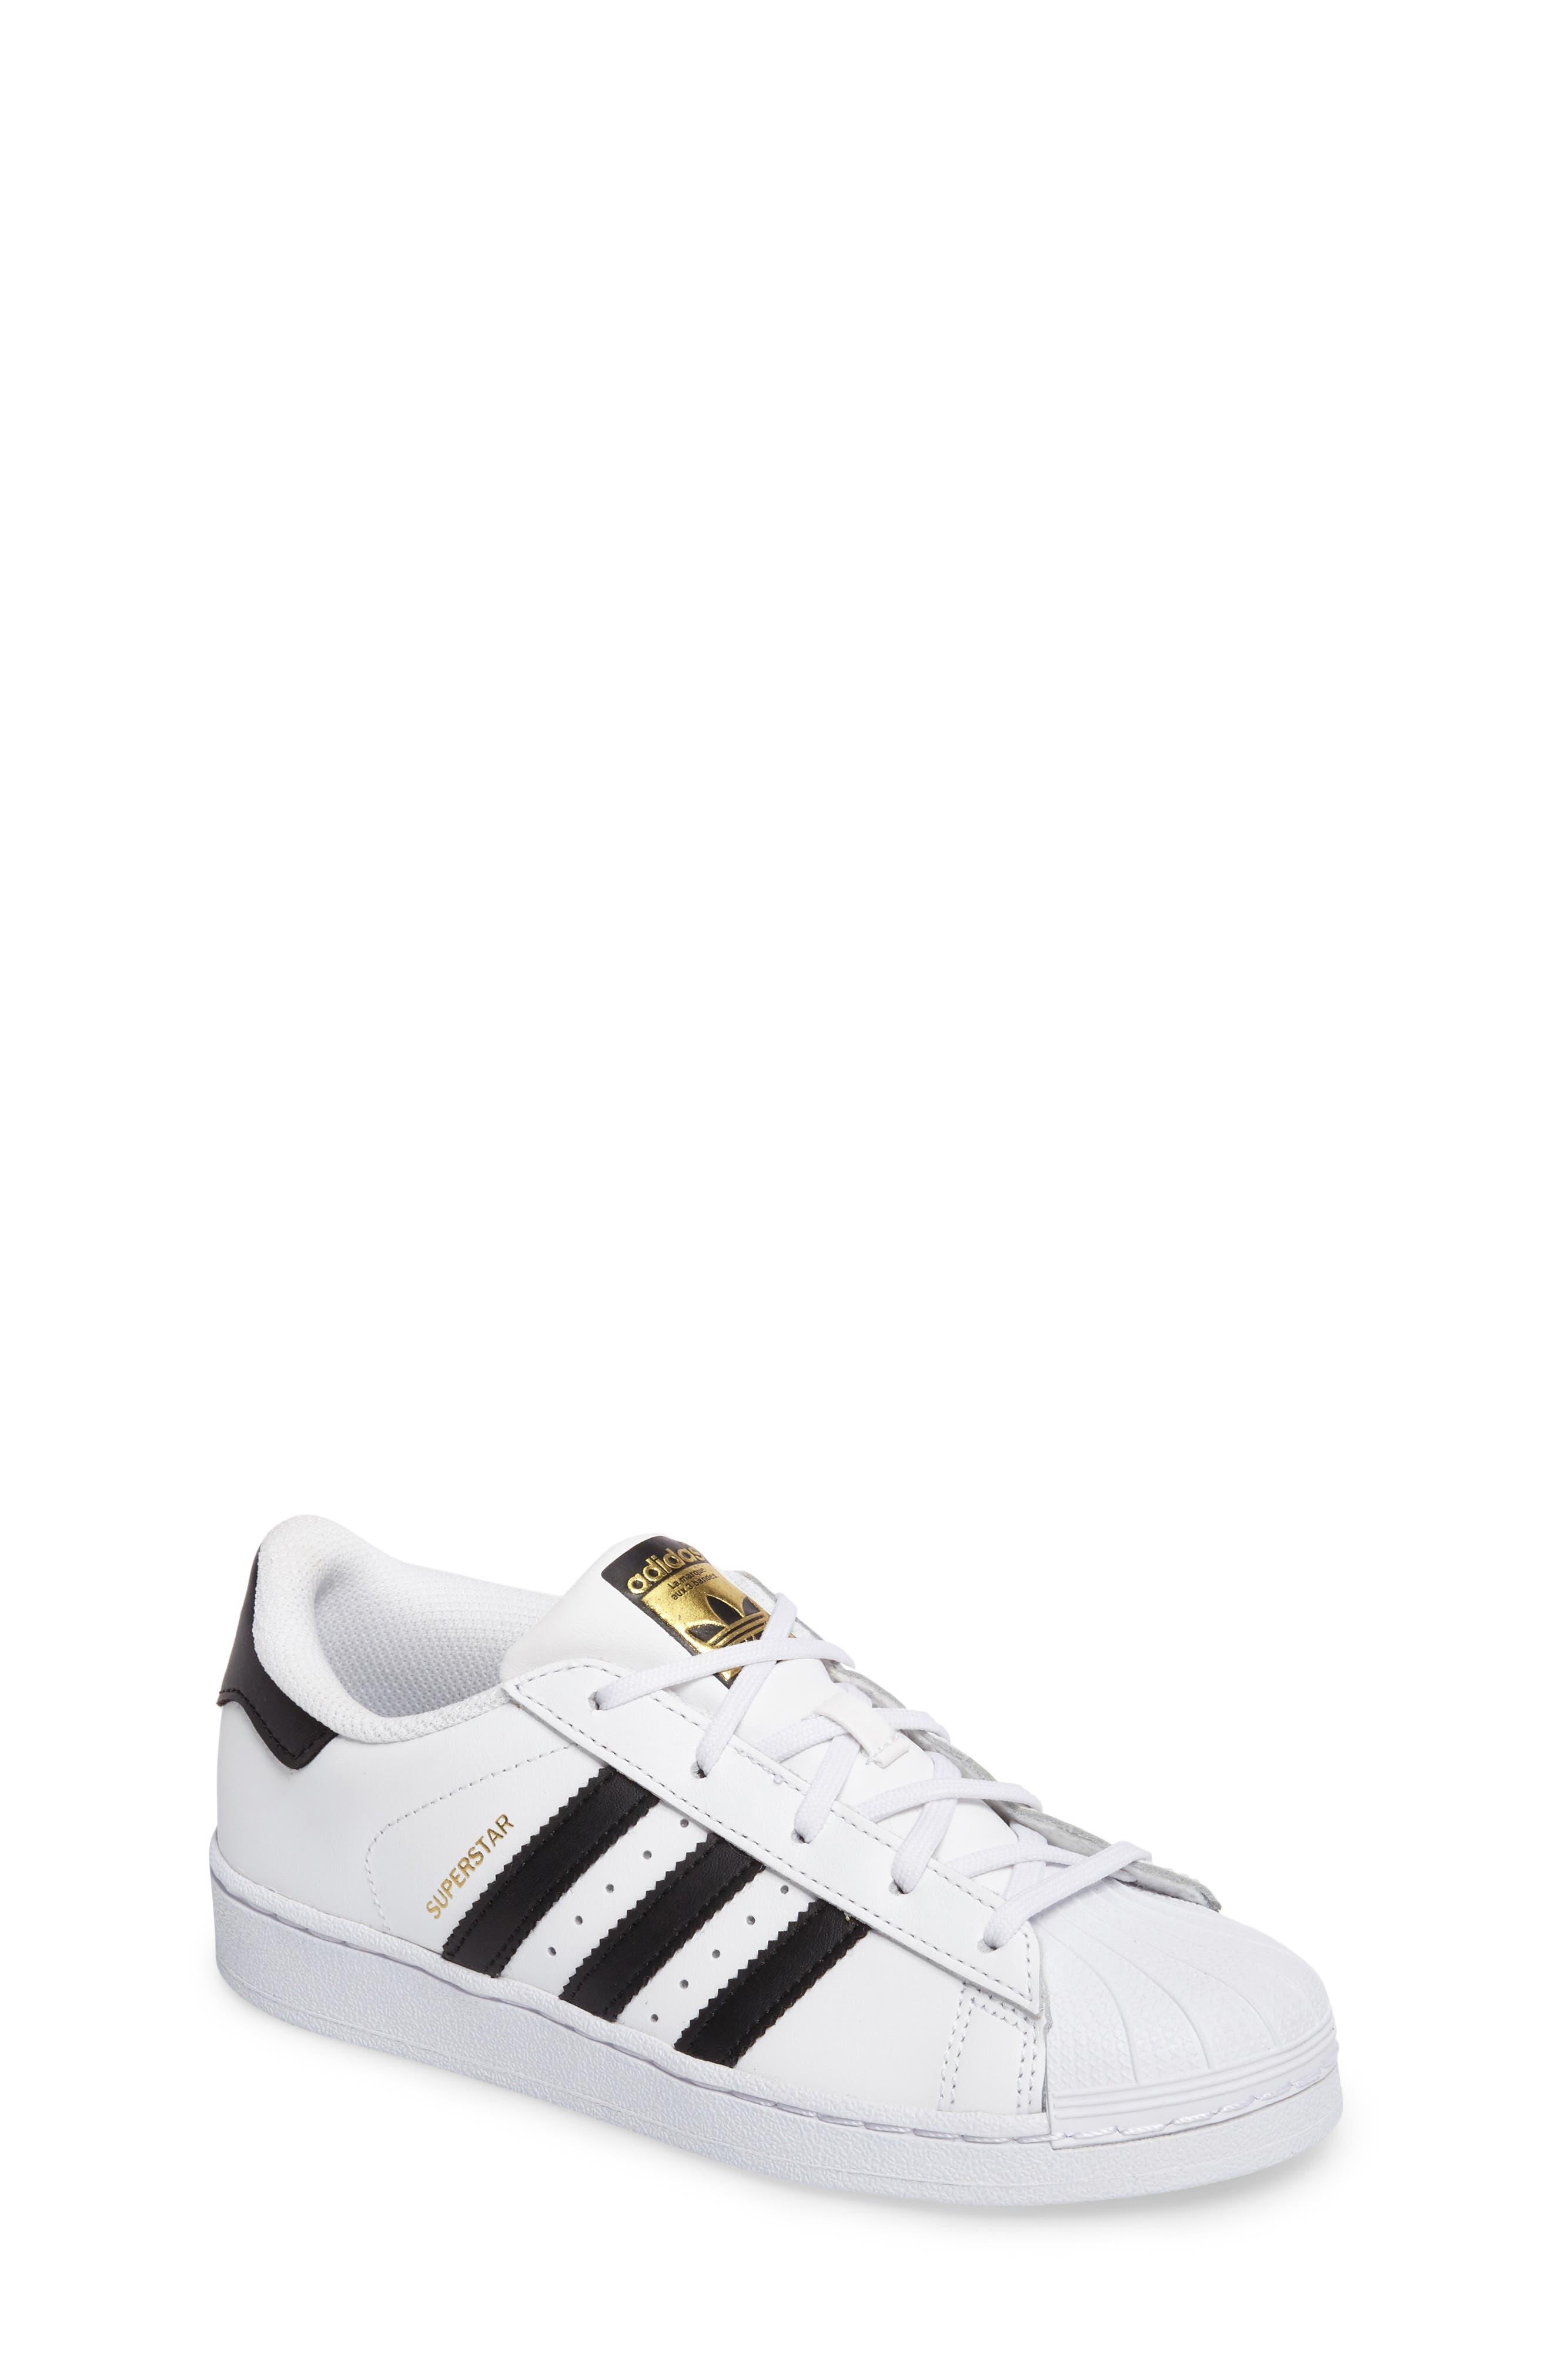 adidas \u0027Superstar Foundation\u0027 Sneaker (Toddler \u0026 Little Kid)